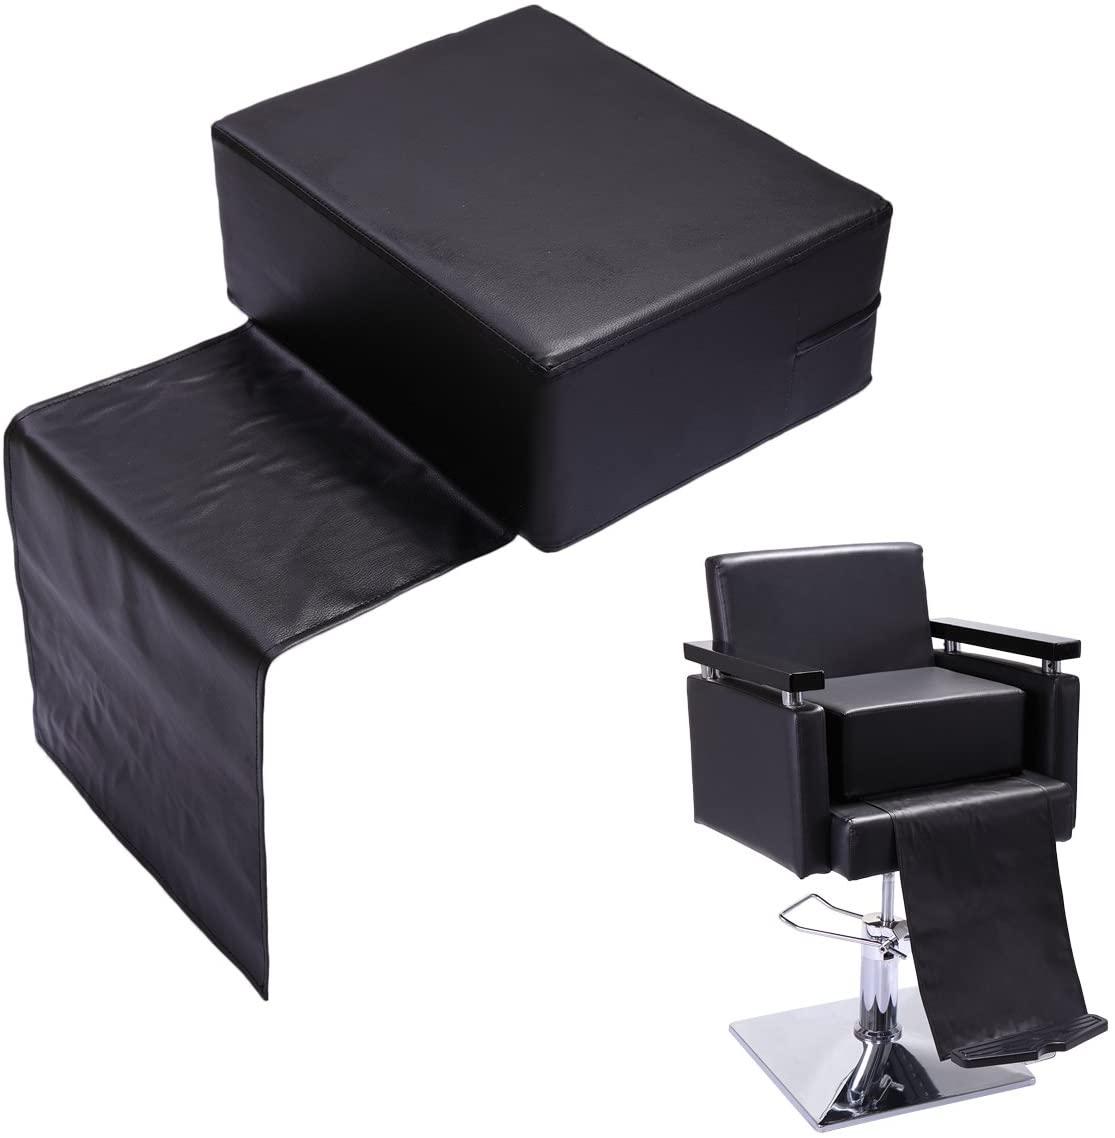 Barber Beauty Salon Spa for Child Hair Cutting, Cushion for Styling Chair, Barber Beauty Salon Spa Equipment